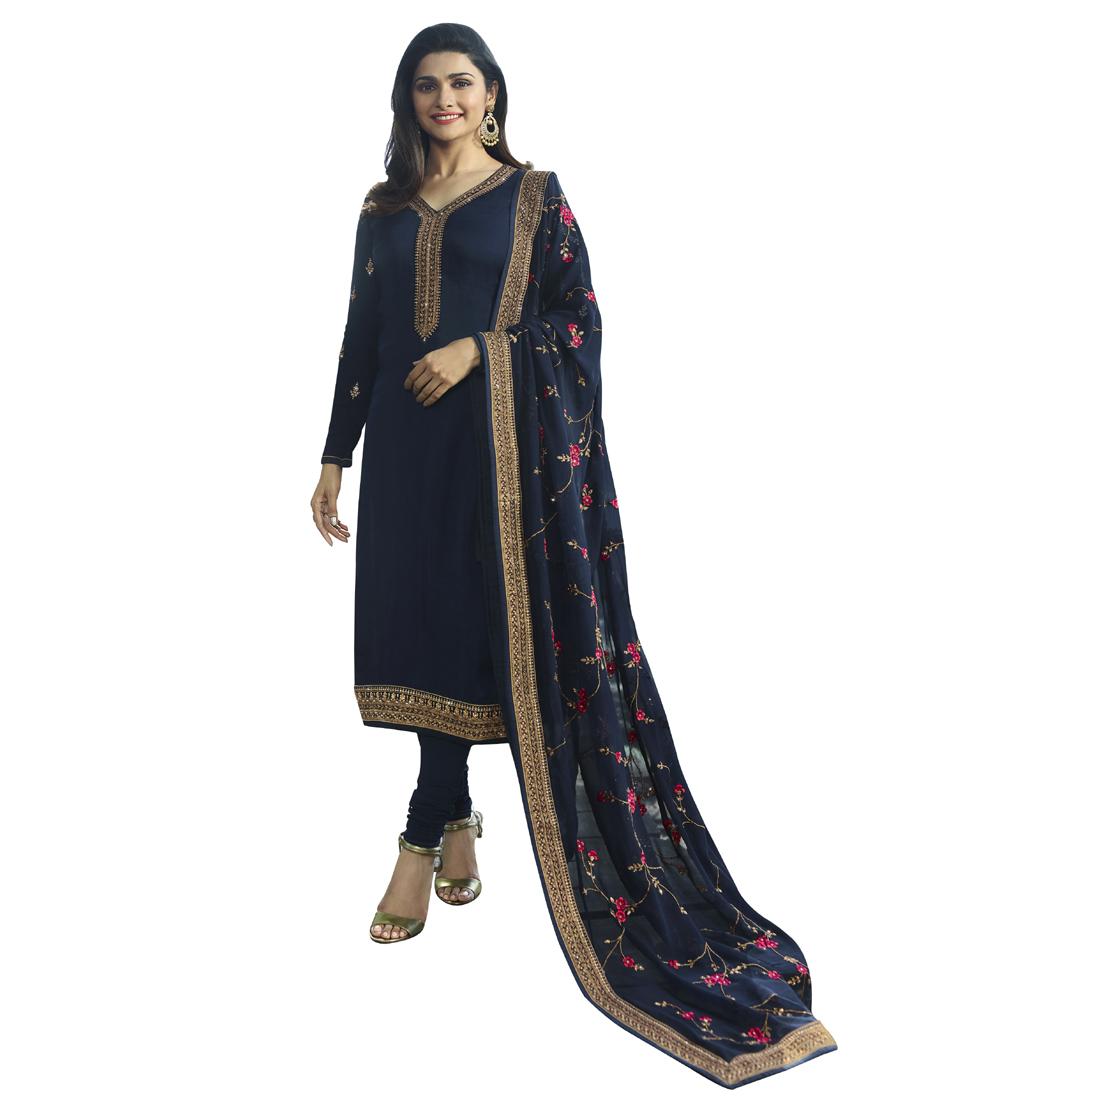 Prachi Desai Peach Georgette Churidar Suit With santoon Dupatta